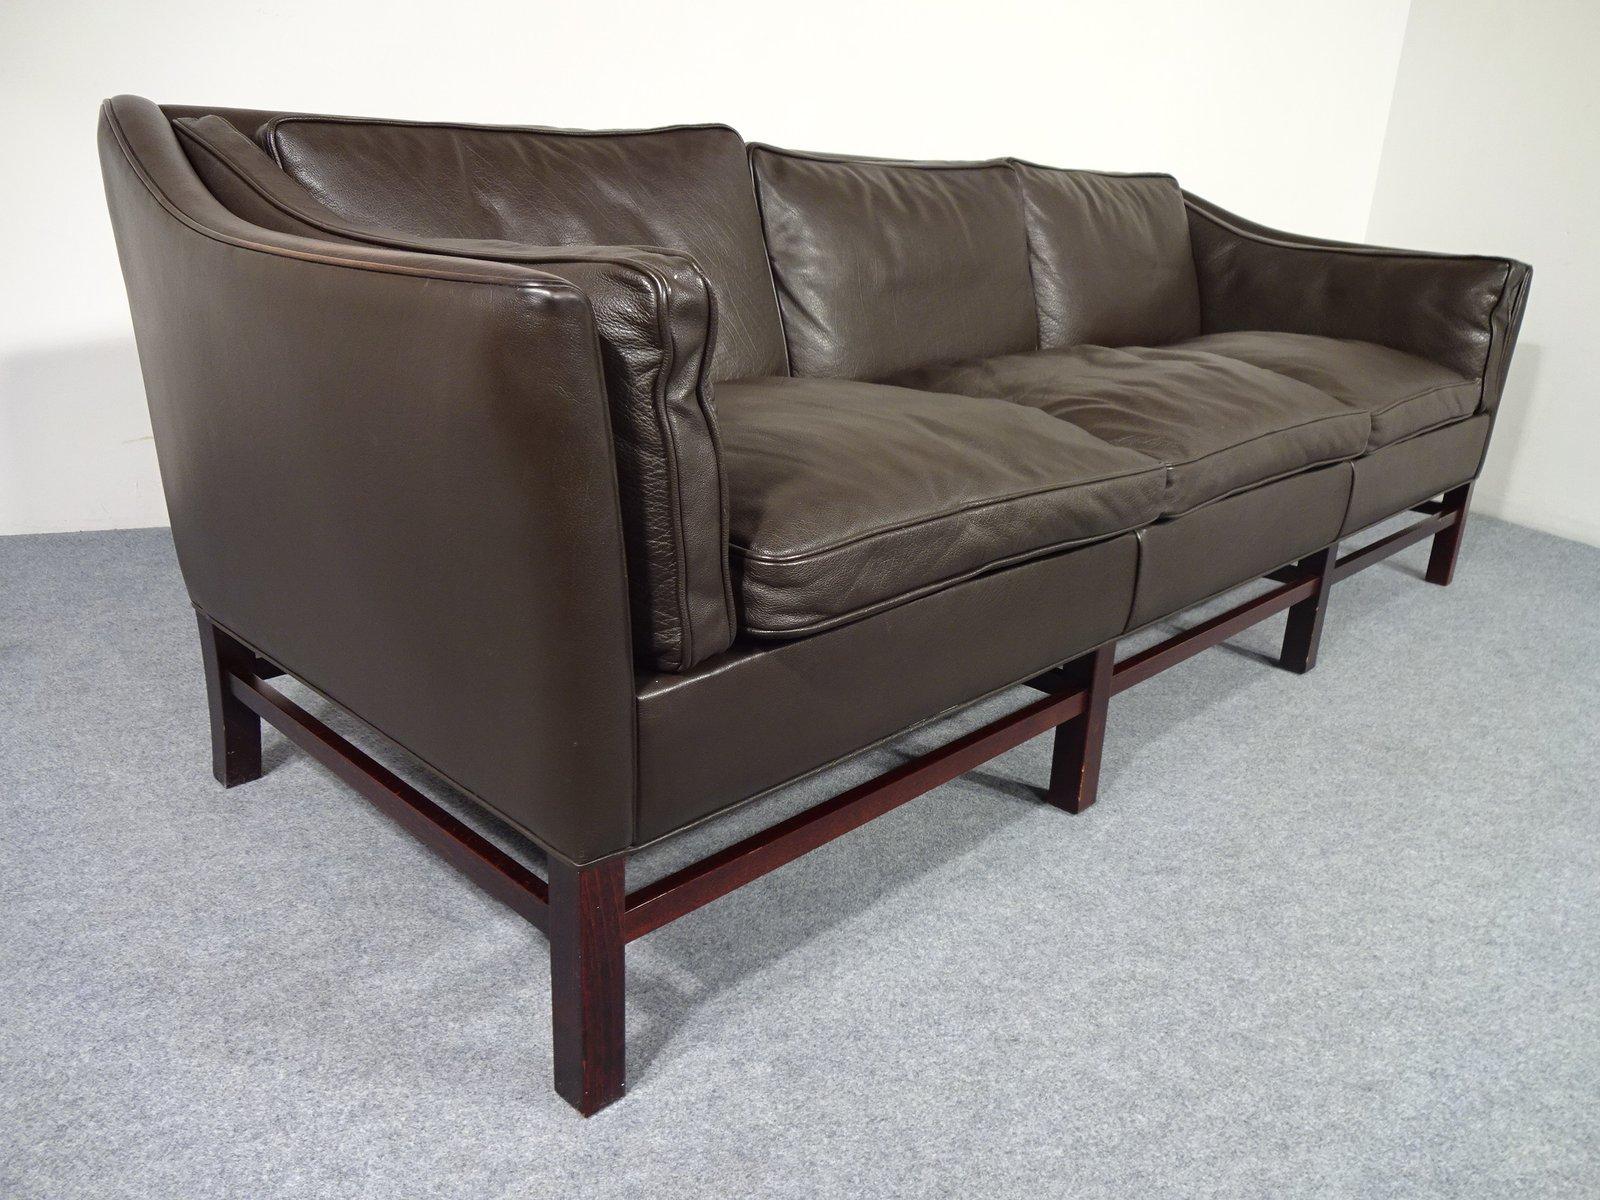 vintage danish leather sofa by georg thams for vejen